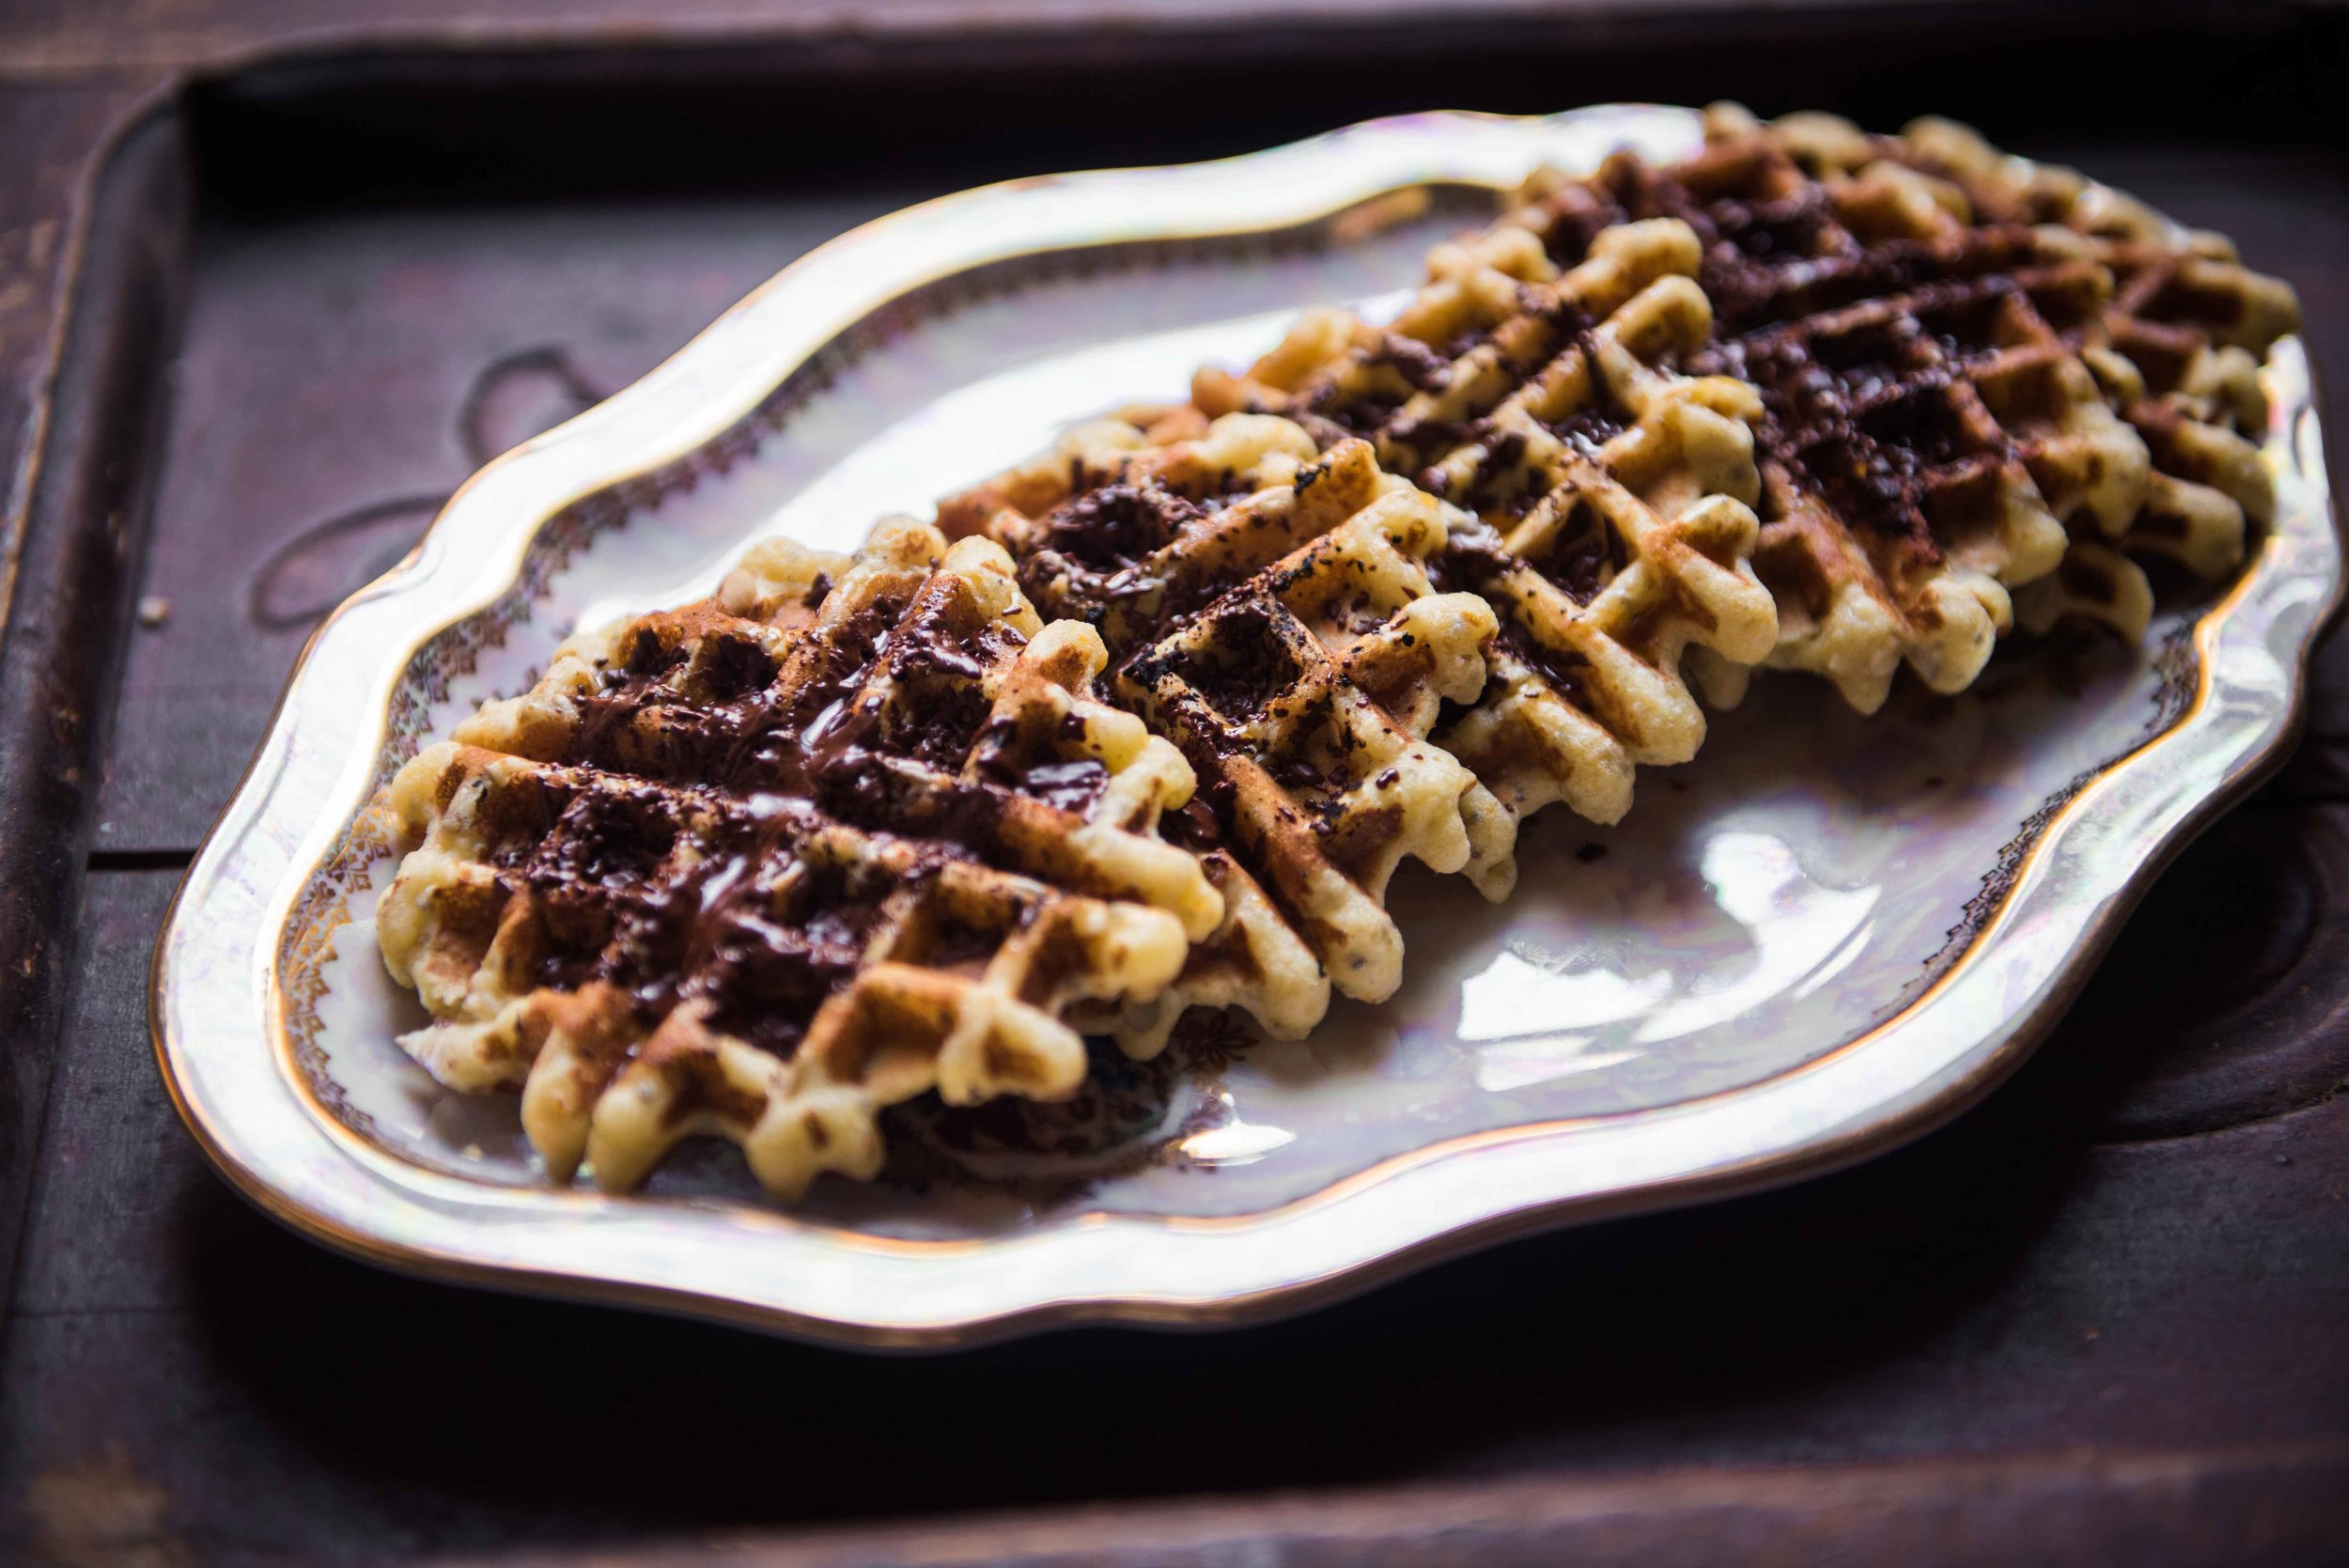 almond flour waffles with chocolate sprinkles